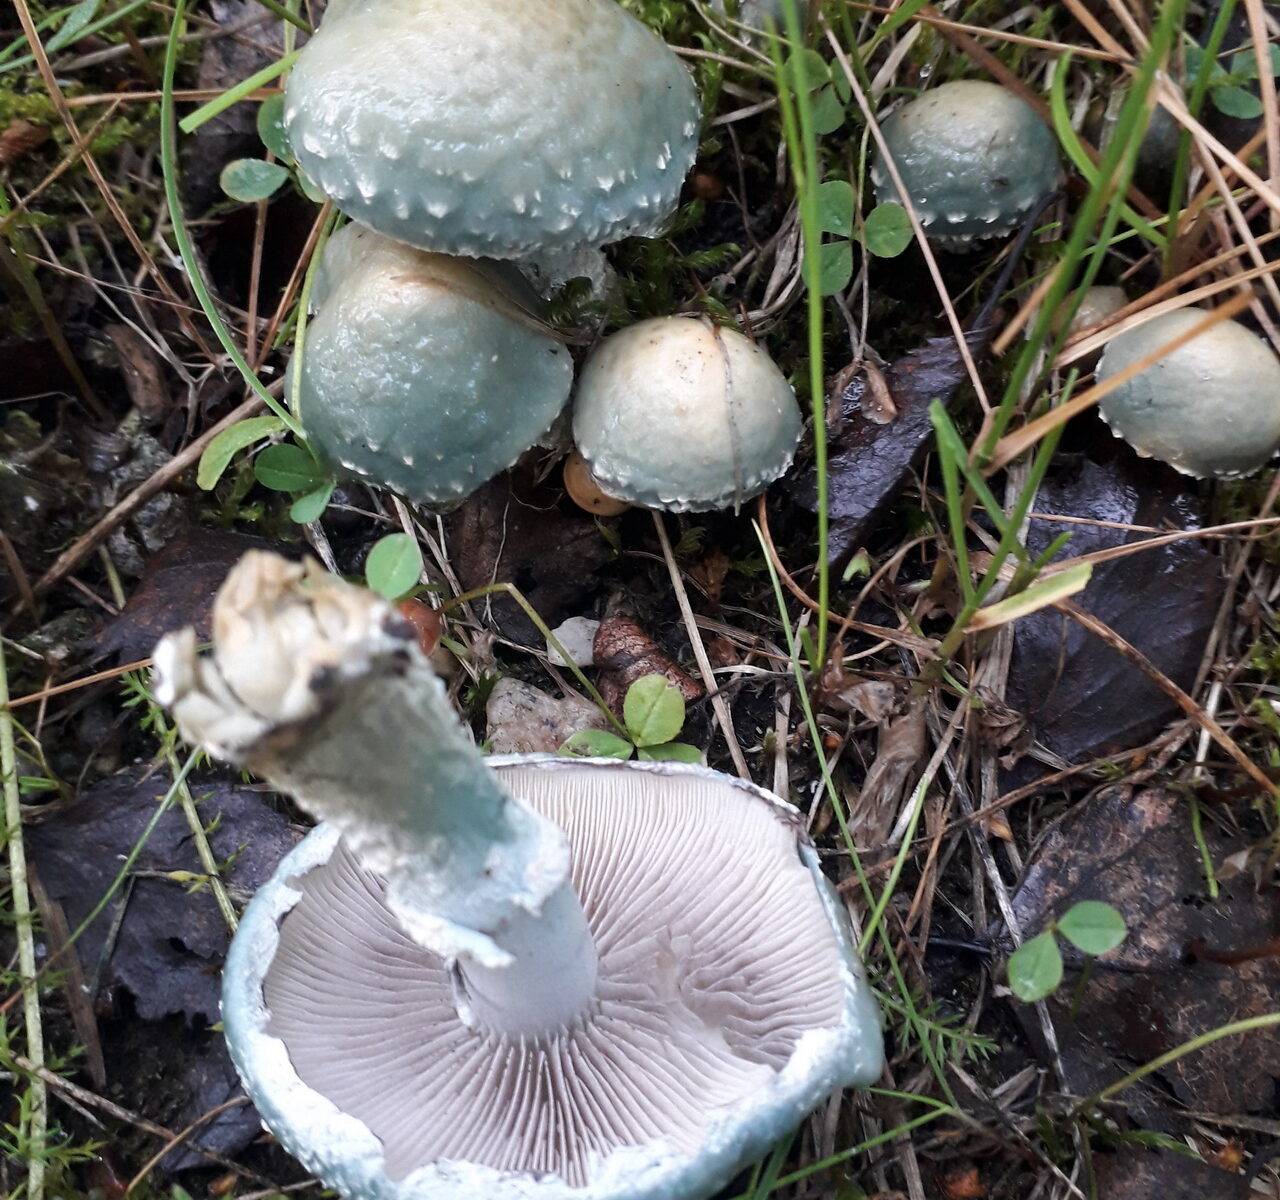 Строфария сине-зеленая Stropharia aeruginosa